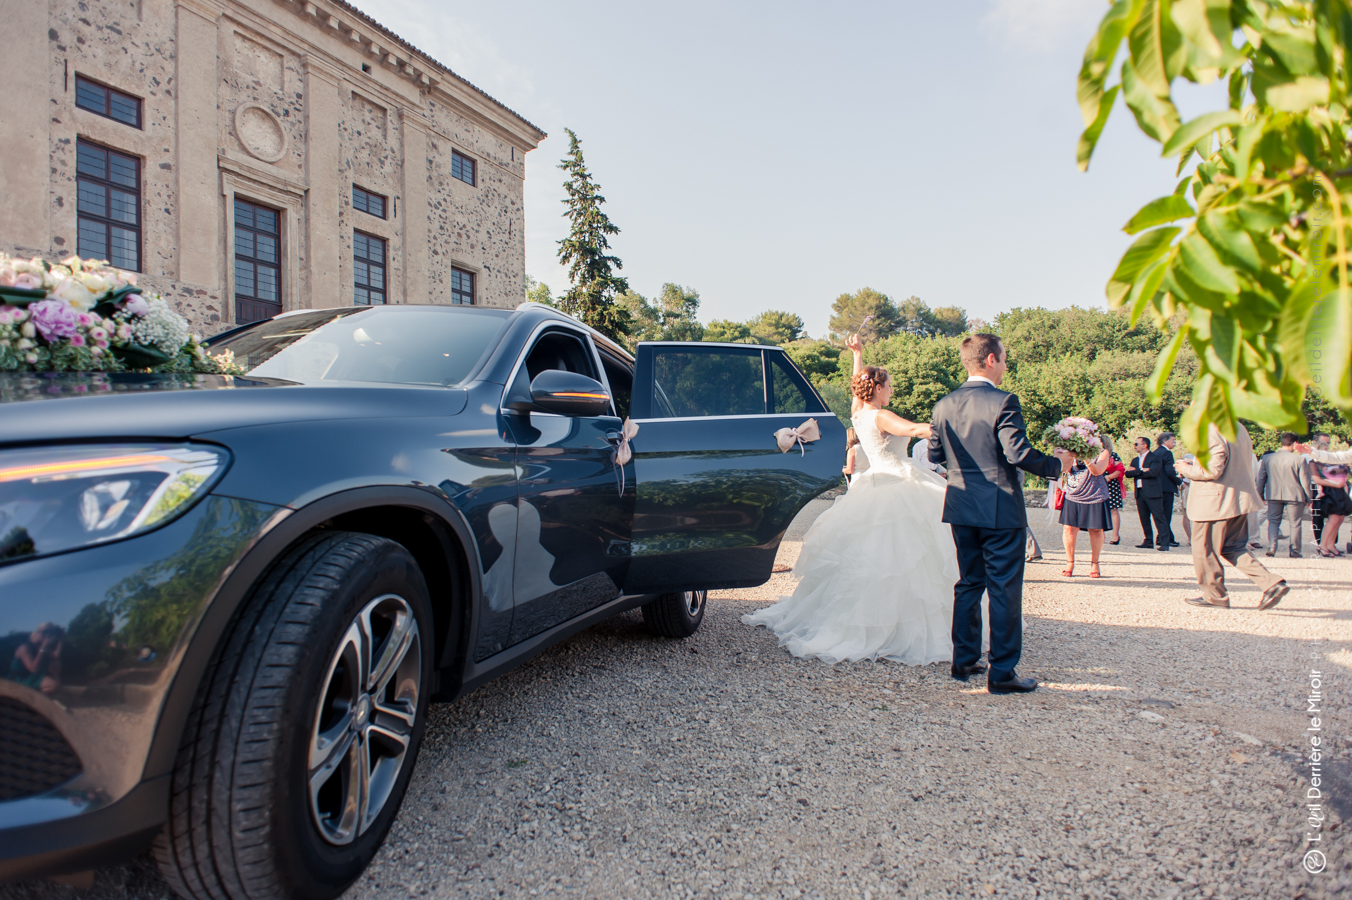 mariage-cj-vaugrenier-loeilderrierelemiroir-051